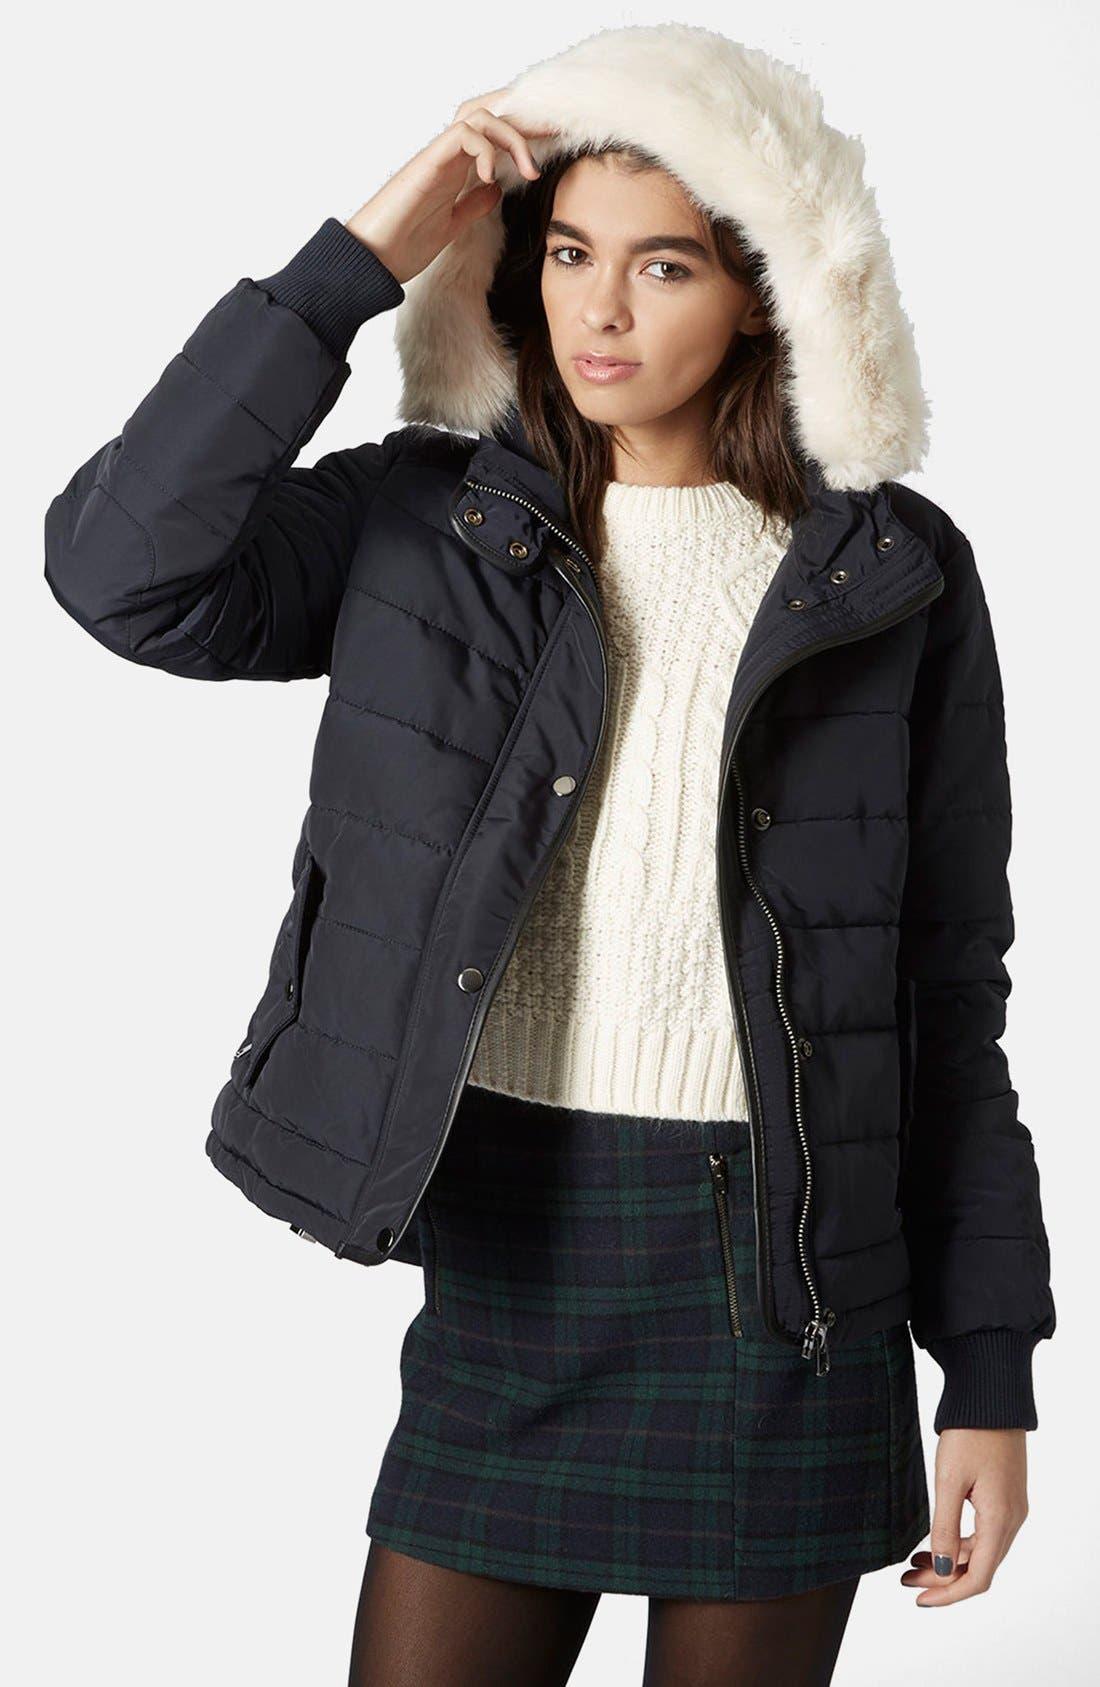 Alternate Image 1 Selected - Topshop Faux Fur Trim Puffer Jacket